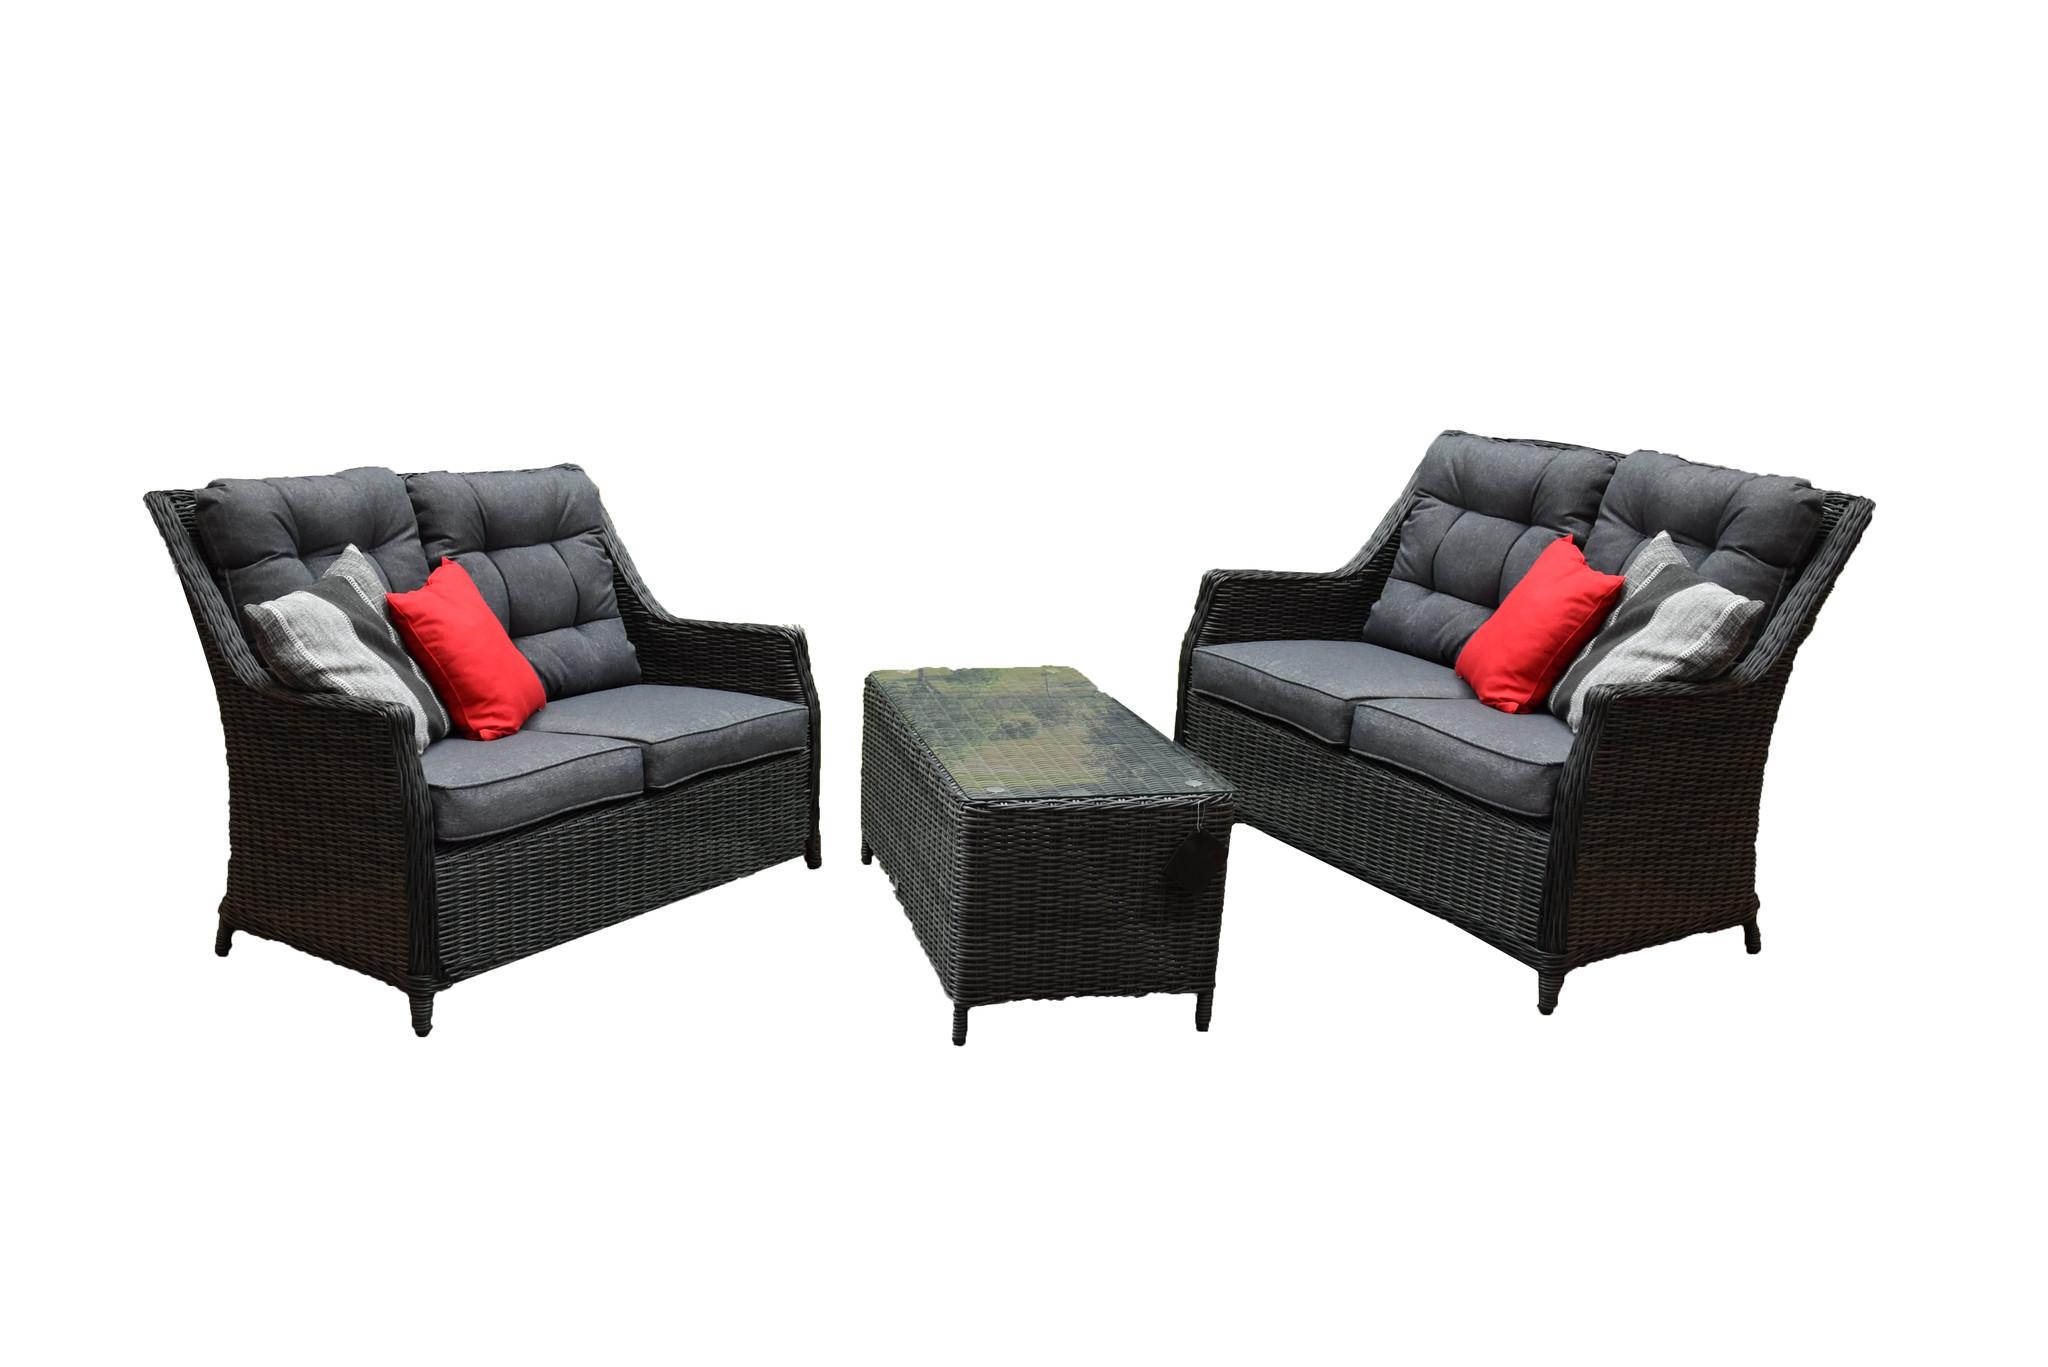 Lounge Bank Eettafel.Dunham Lounge Bank Tafel Set Antraciet